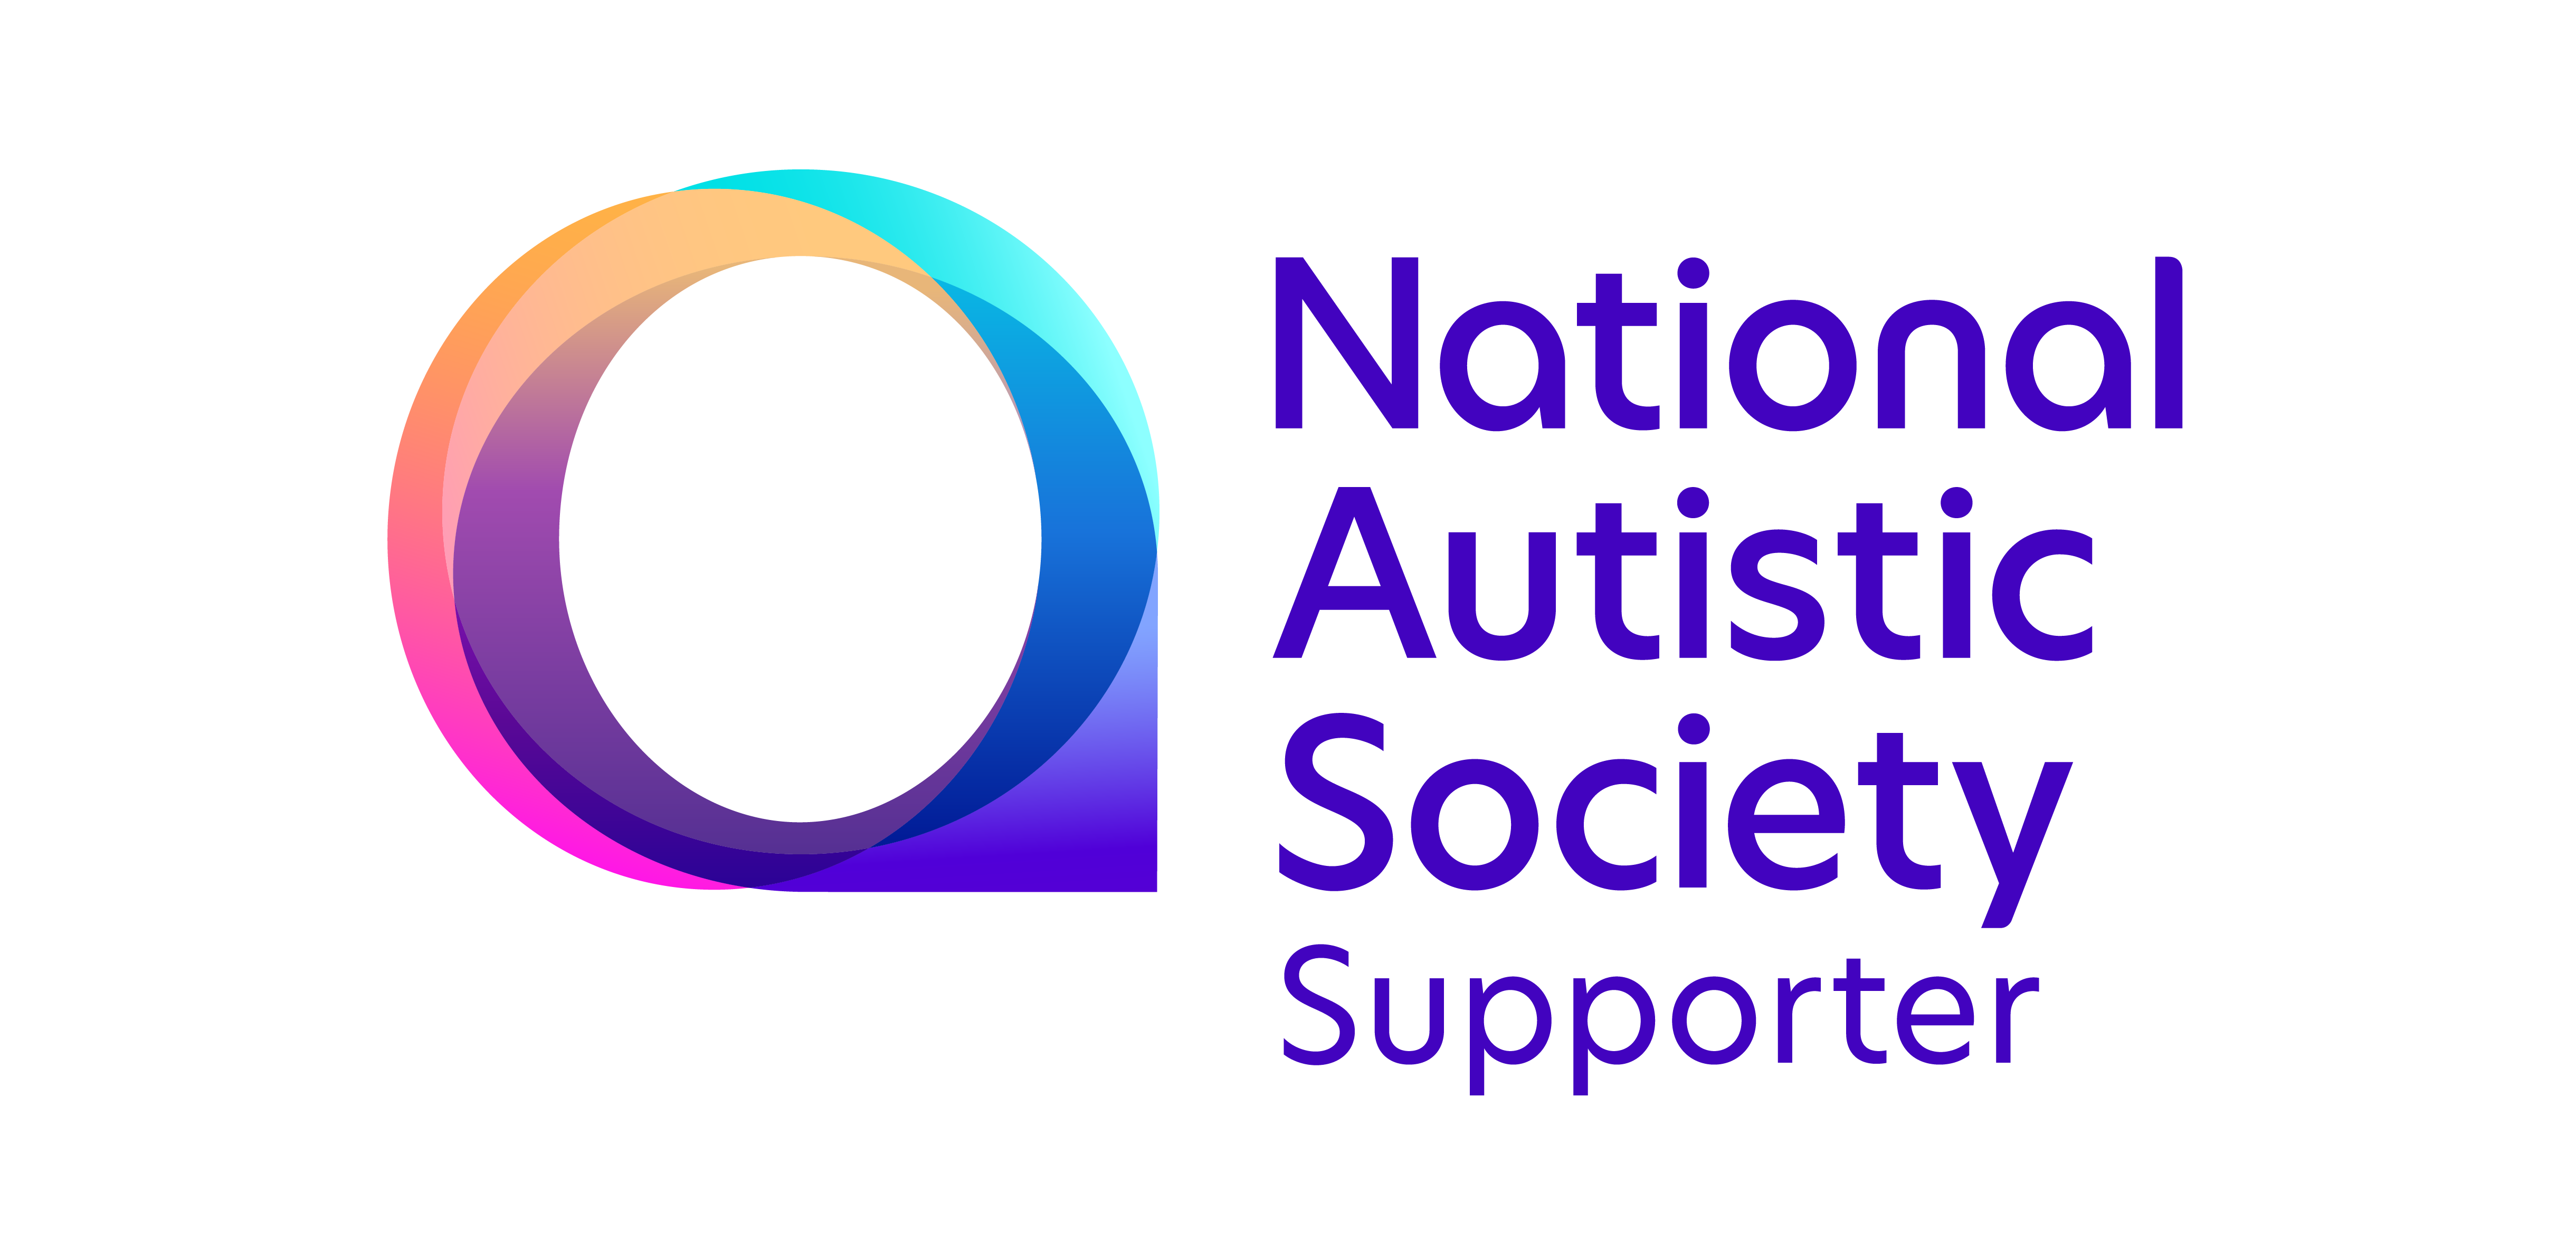 https://www.autism.org.uk/